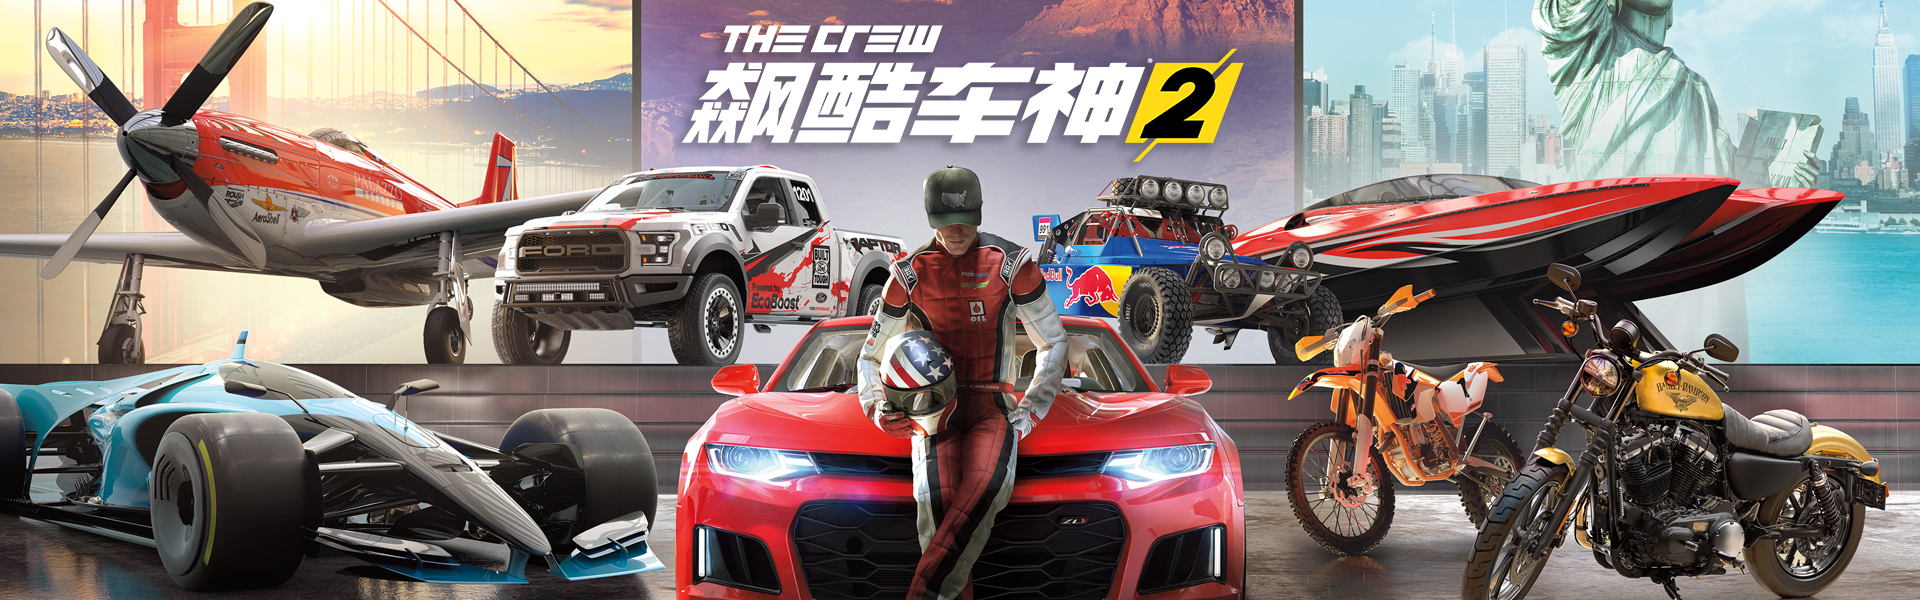 《The Crew 2》,男子站在赛车、摩托车、飞机、越野车和船前。